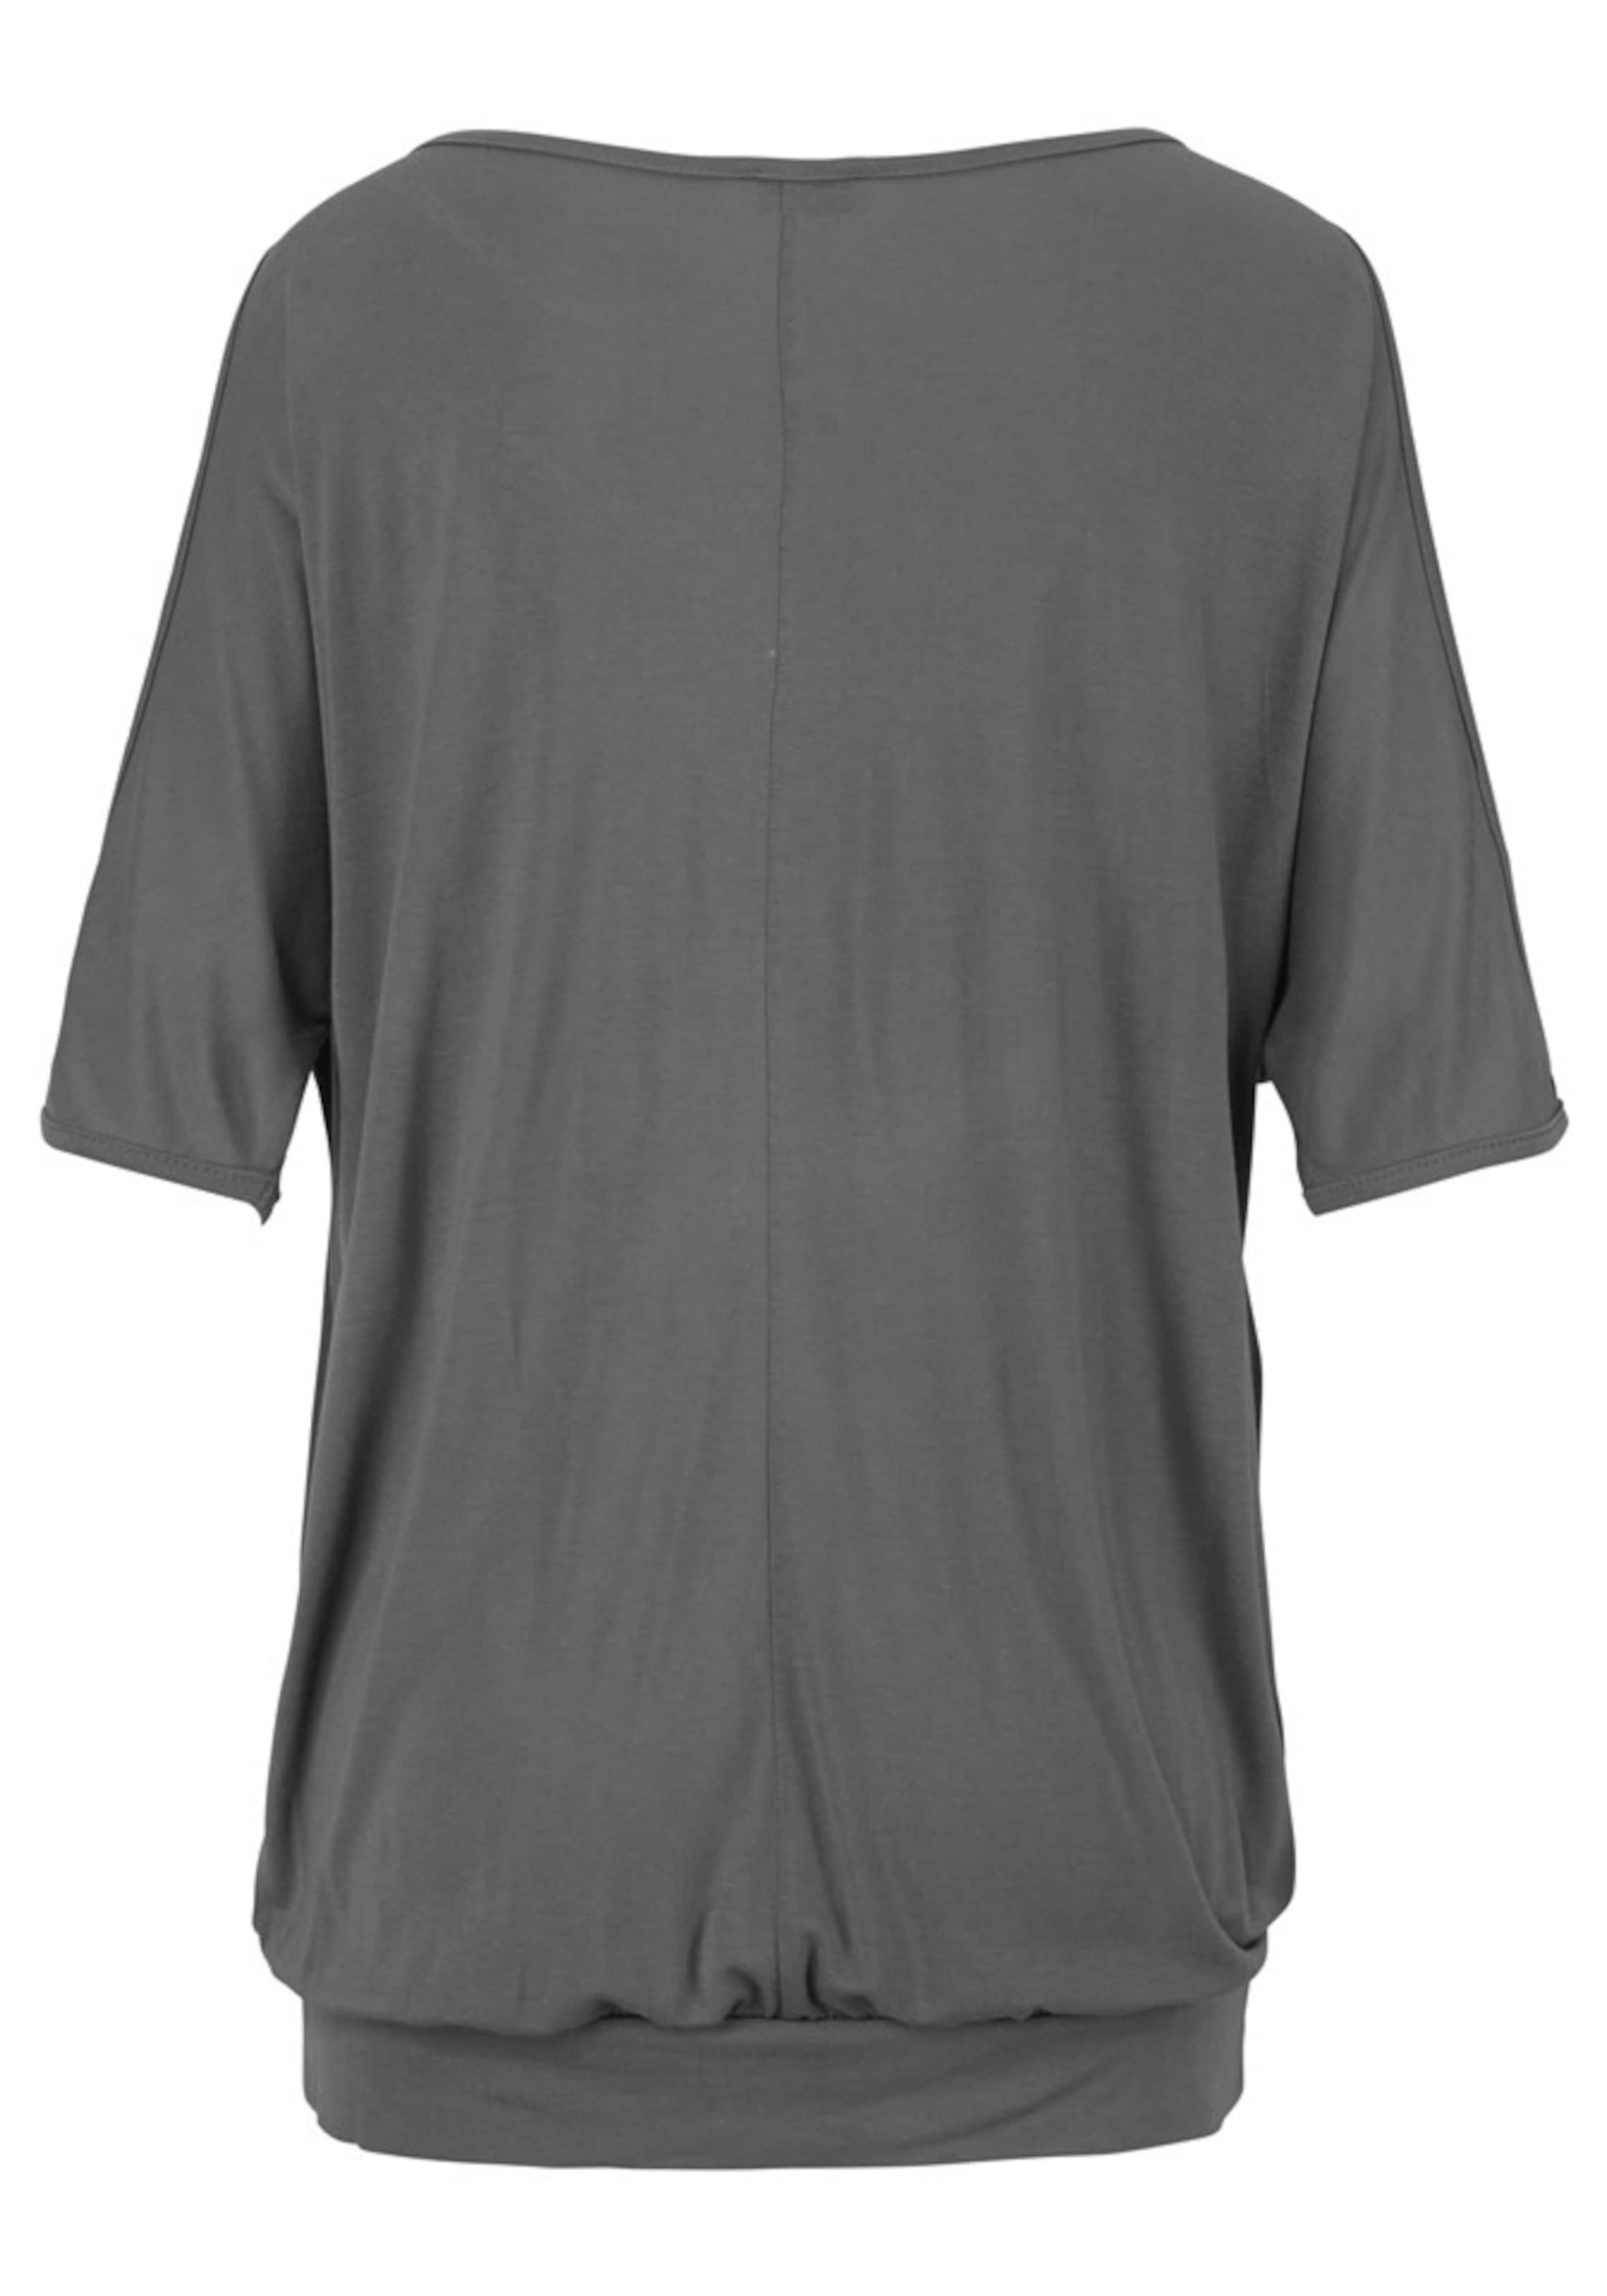 GrauWeiß Lascana Lascana GrauWeiß Shirt In In In Lascana Shirt Shirt GrauWeiß BrxWdCeo